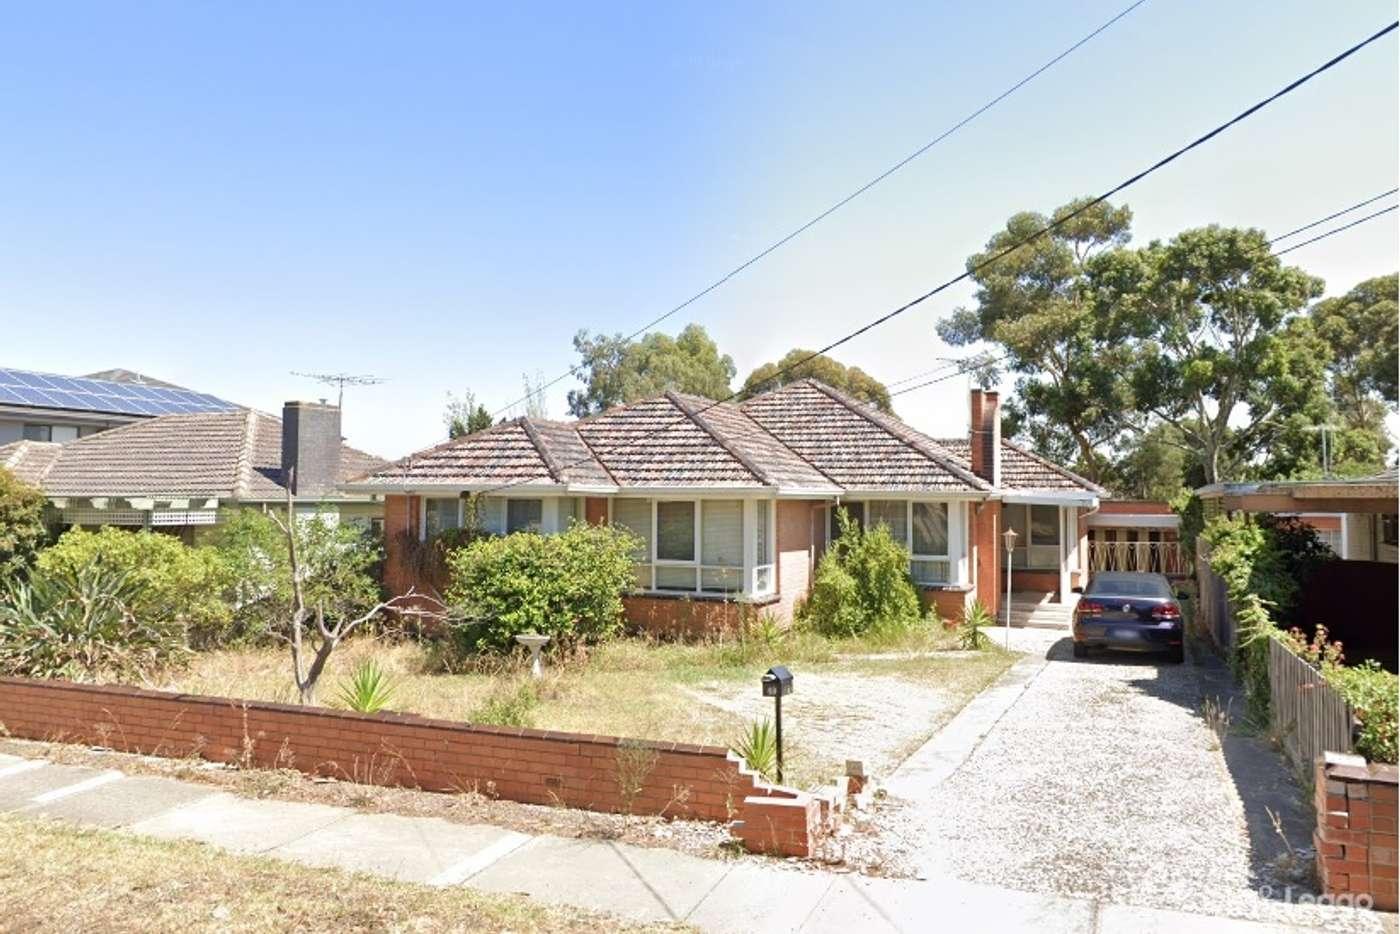 Main view of Homely house listing, 49 Gordon Street, Tullamarine VIC 3043